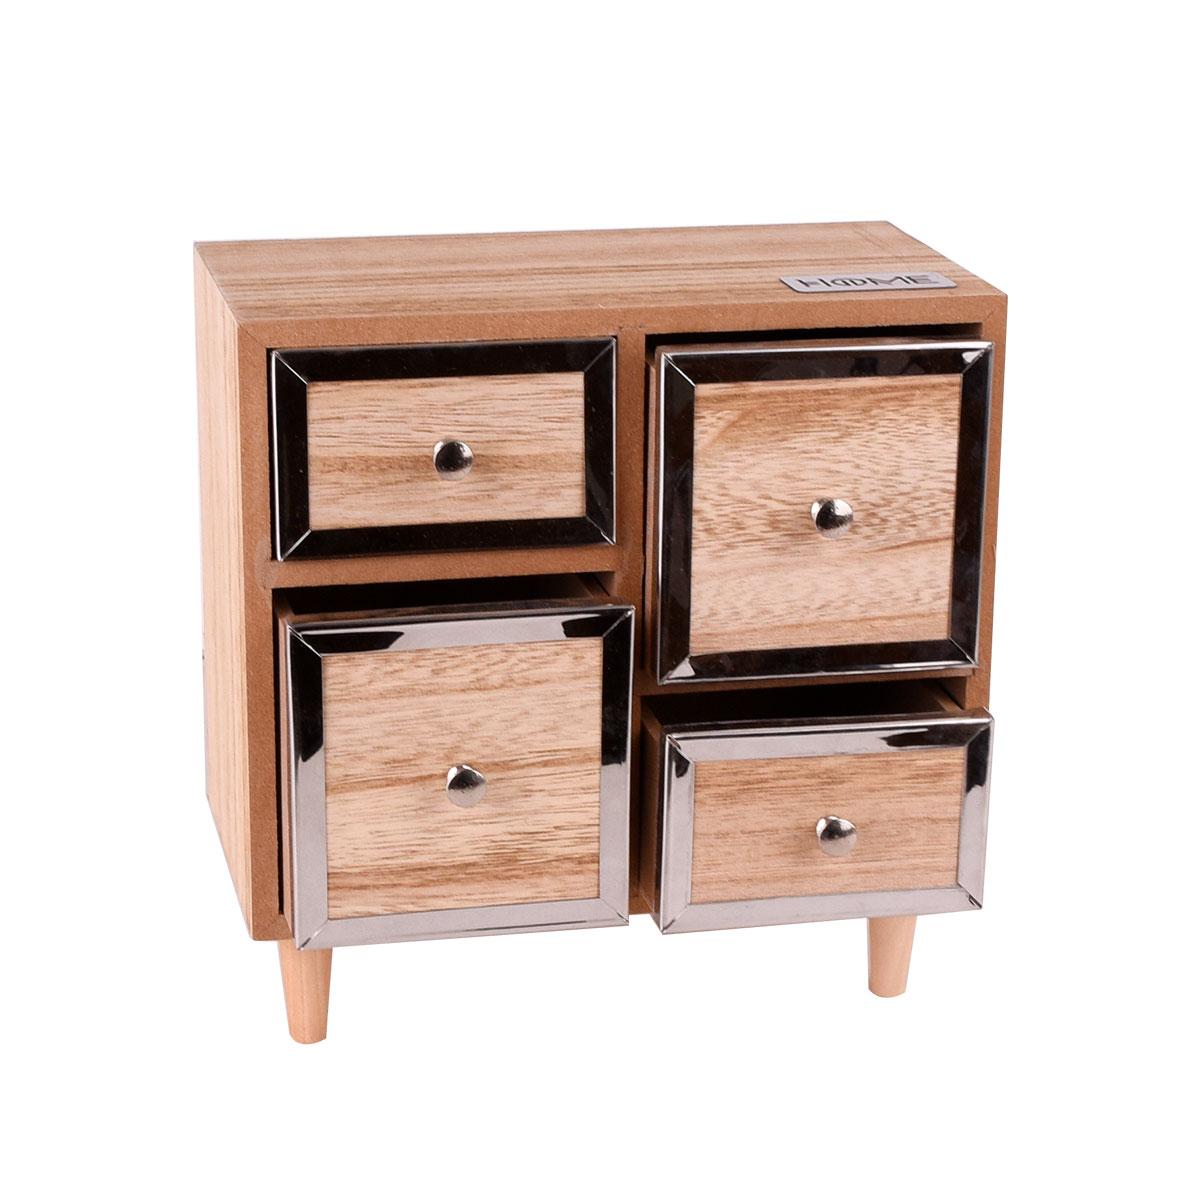 منظم مجوهرات واكسسوارات  خشبي - 4 ادراج - رقم 18016